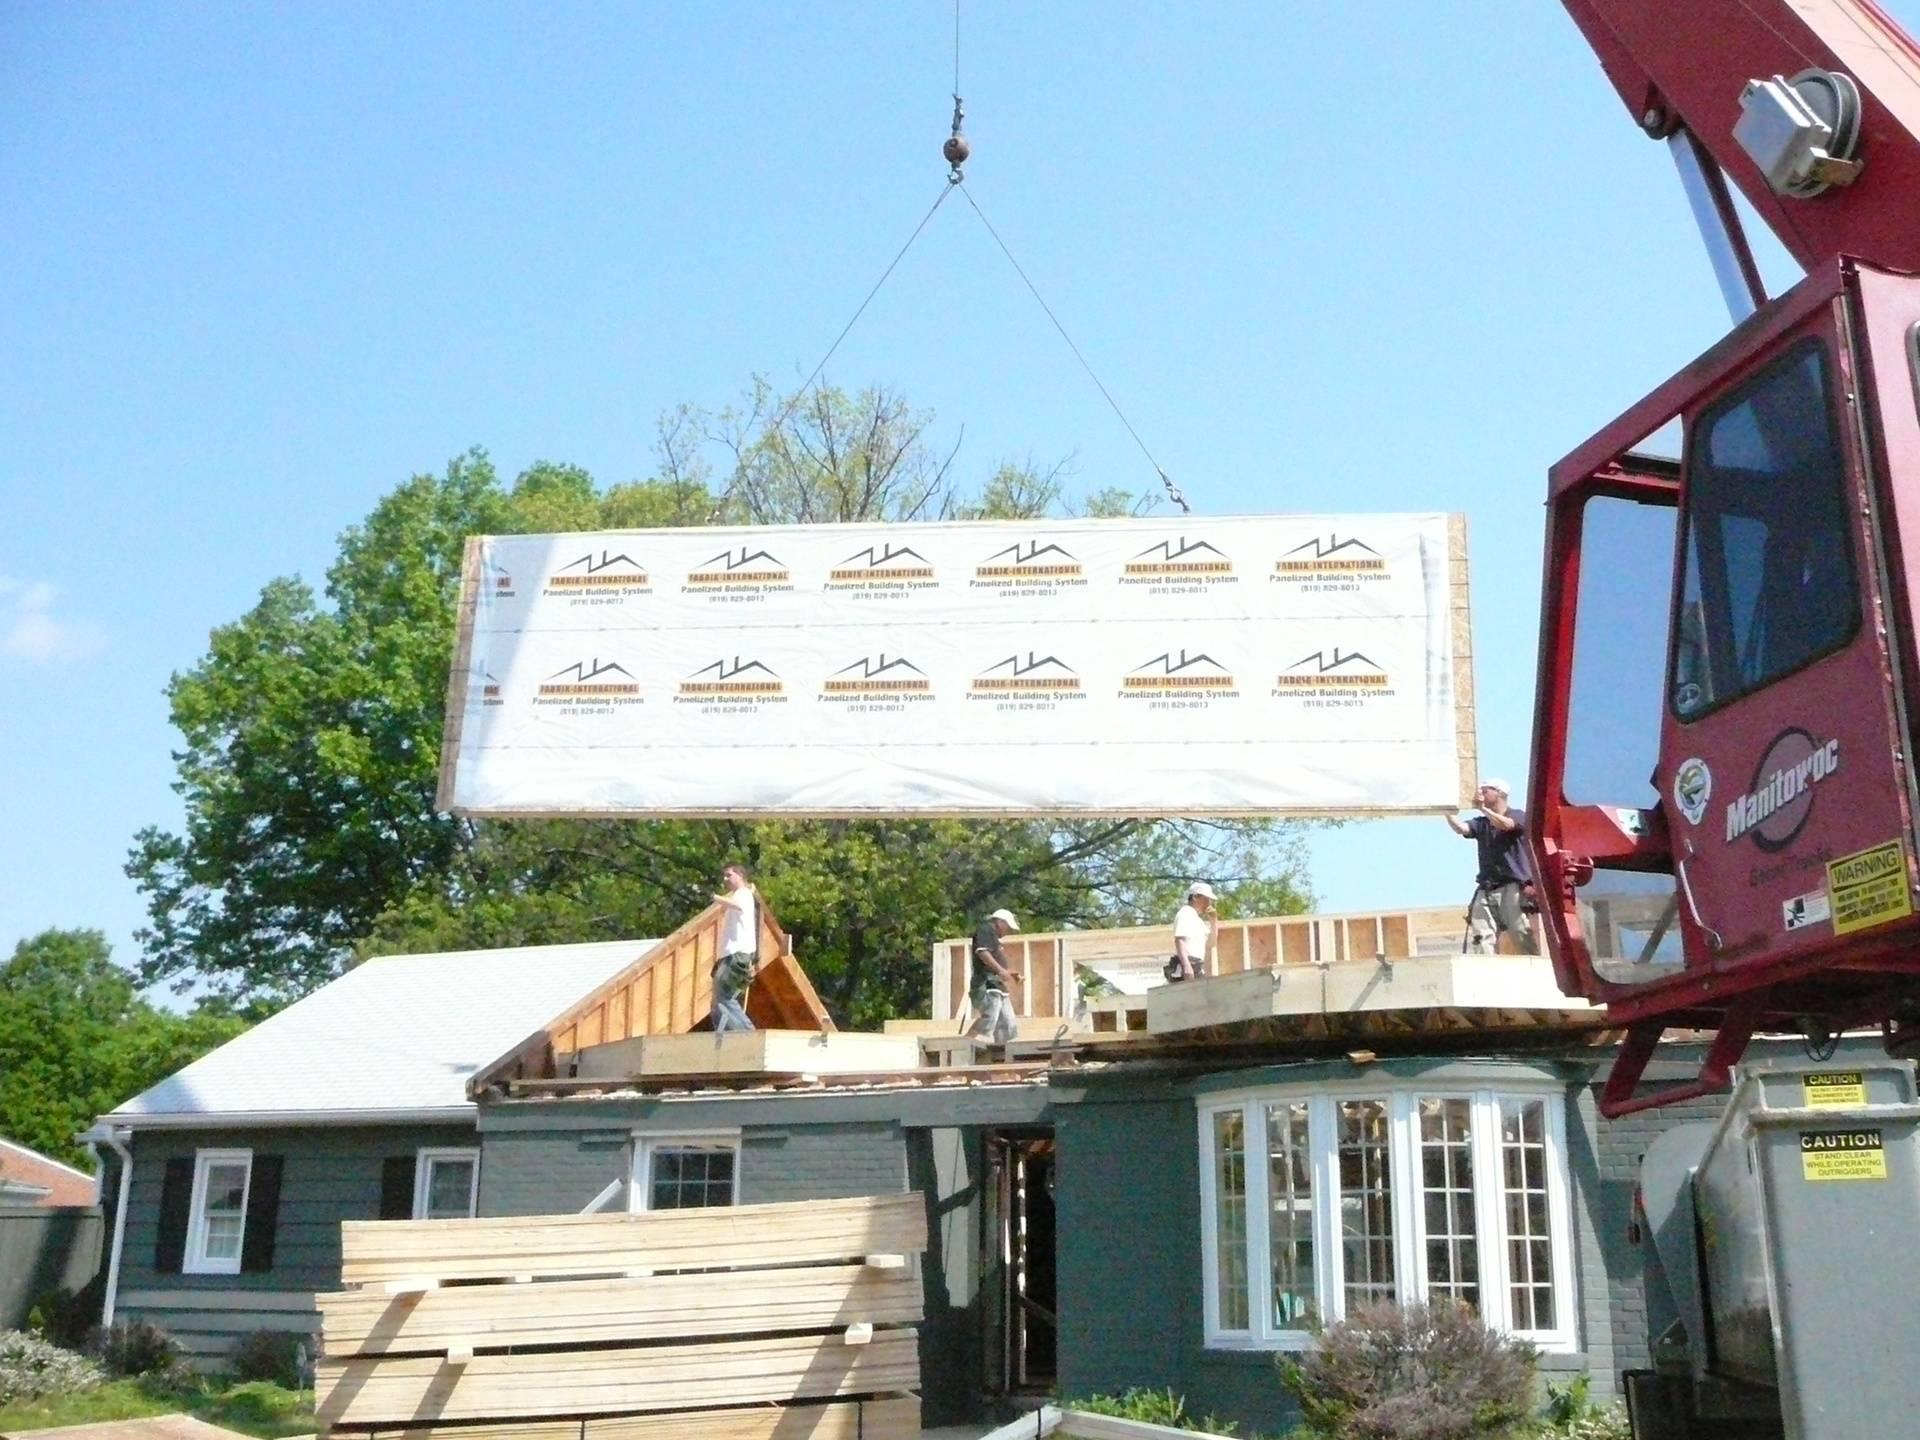 Panelized - Renovation